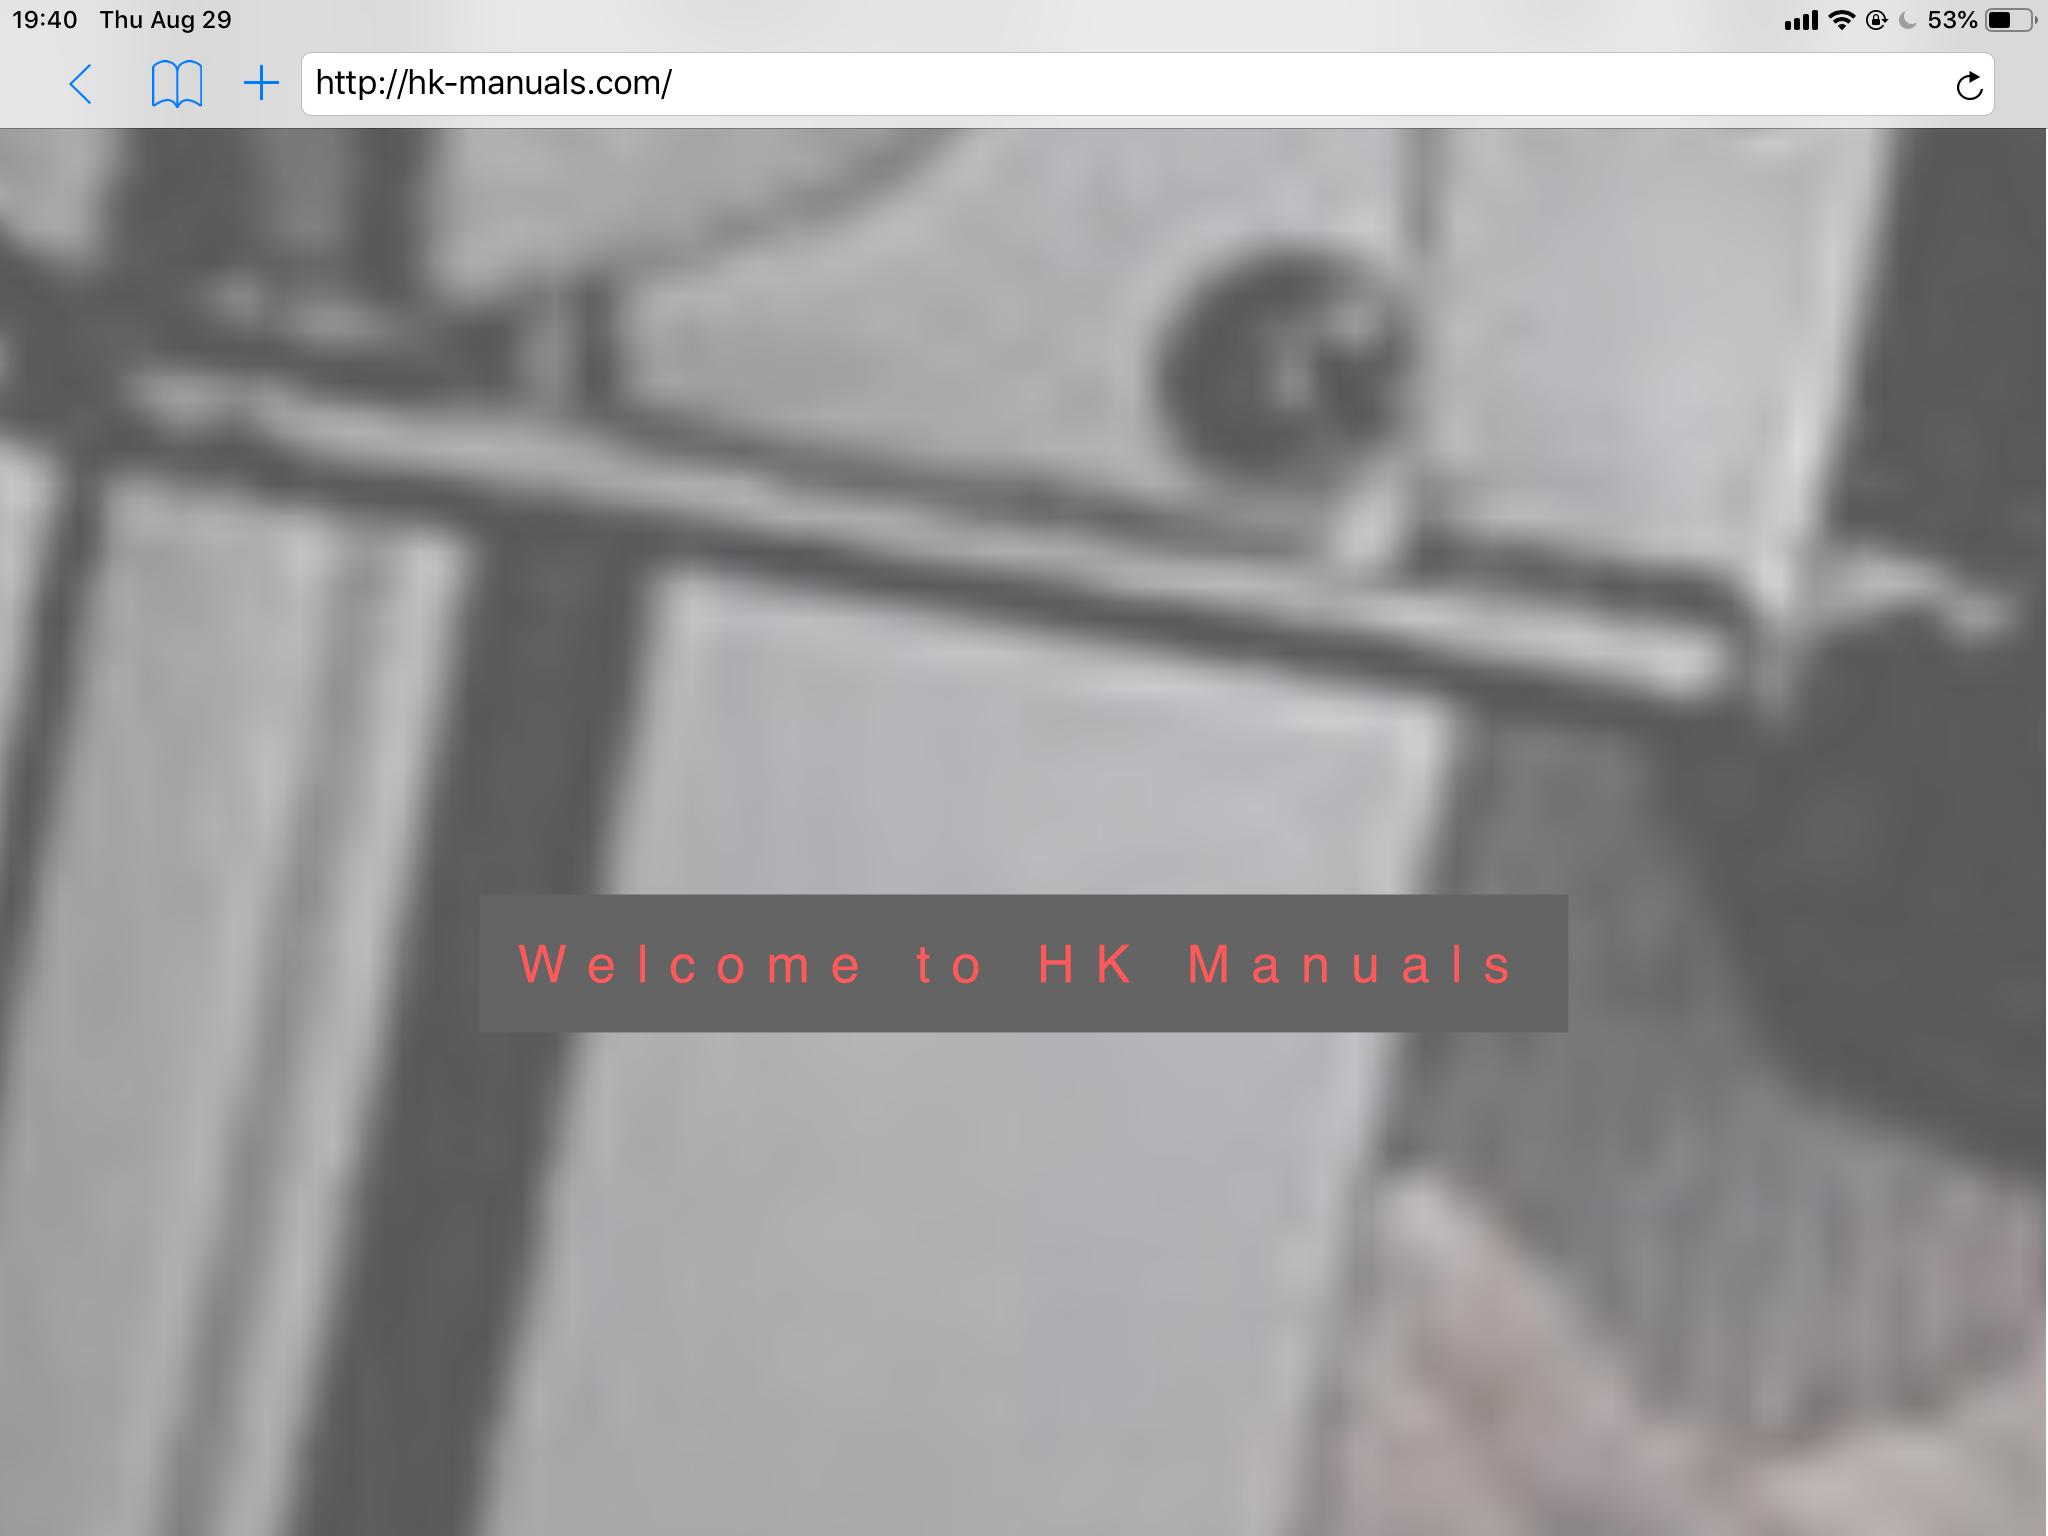 HK PDF Manuals-1e13d956-f23e-467d-9e0f-e24b84f2d24f.png